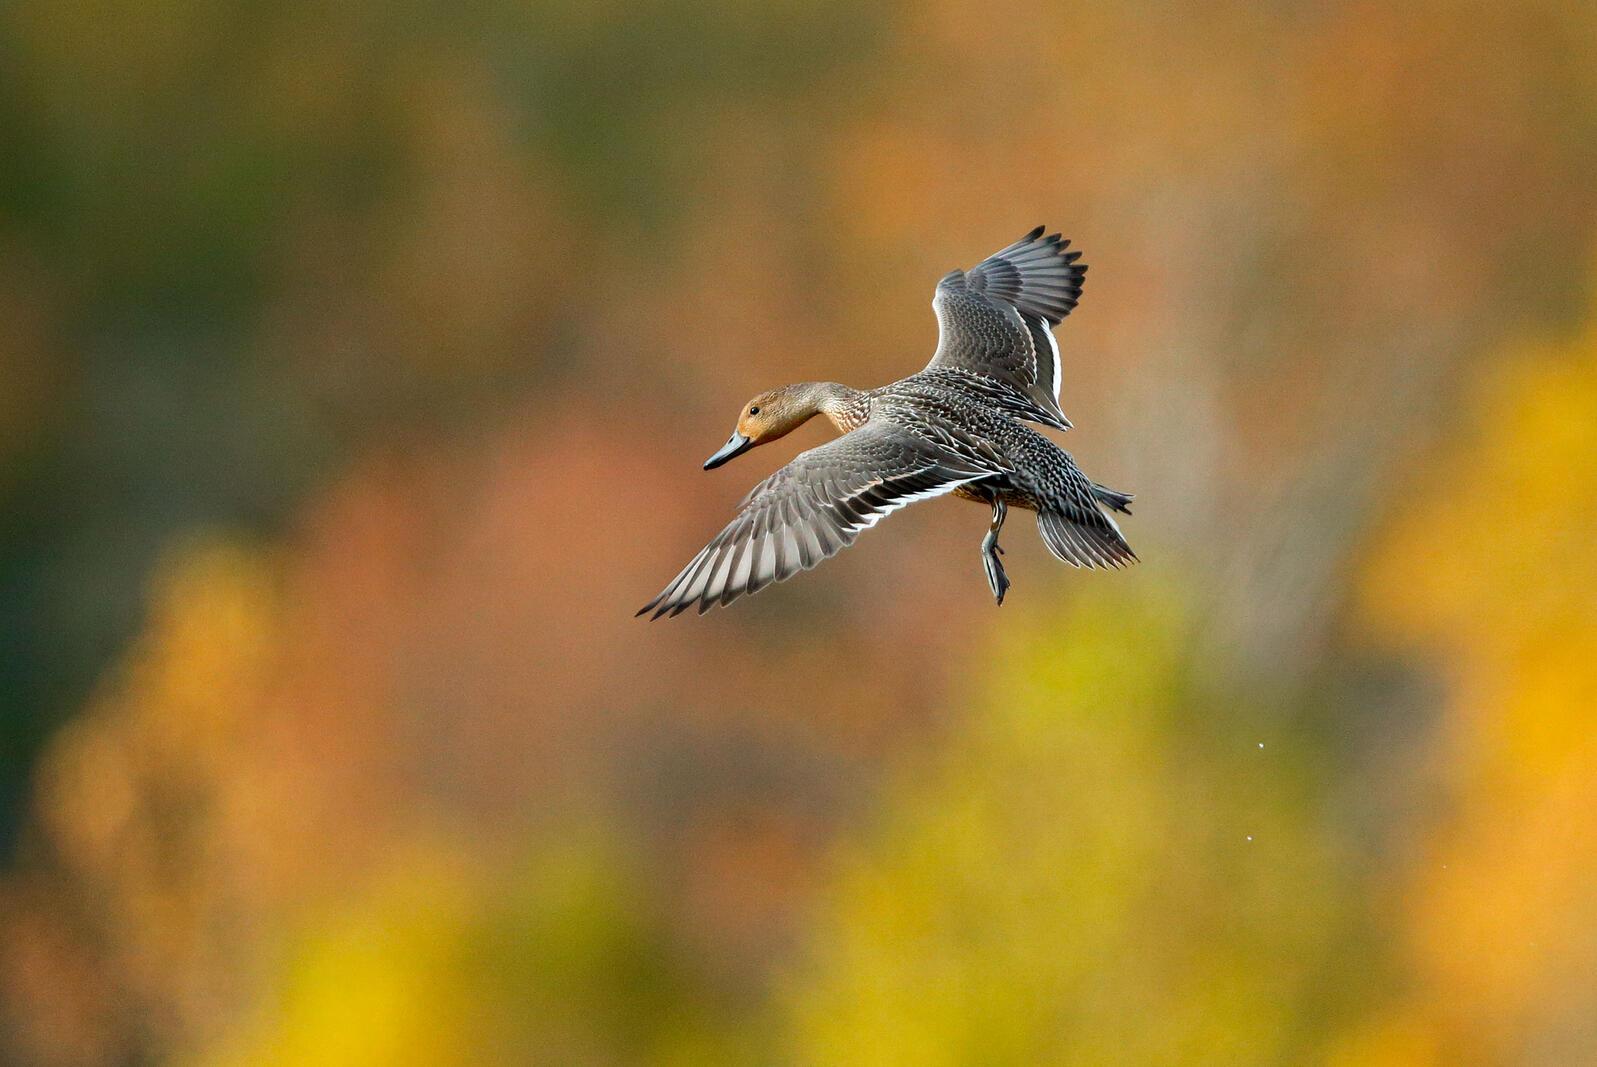 Northern Pintail. Ruhikanta Meetei/Audubon Photography Awards